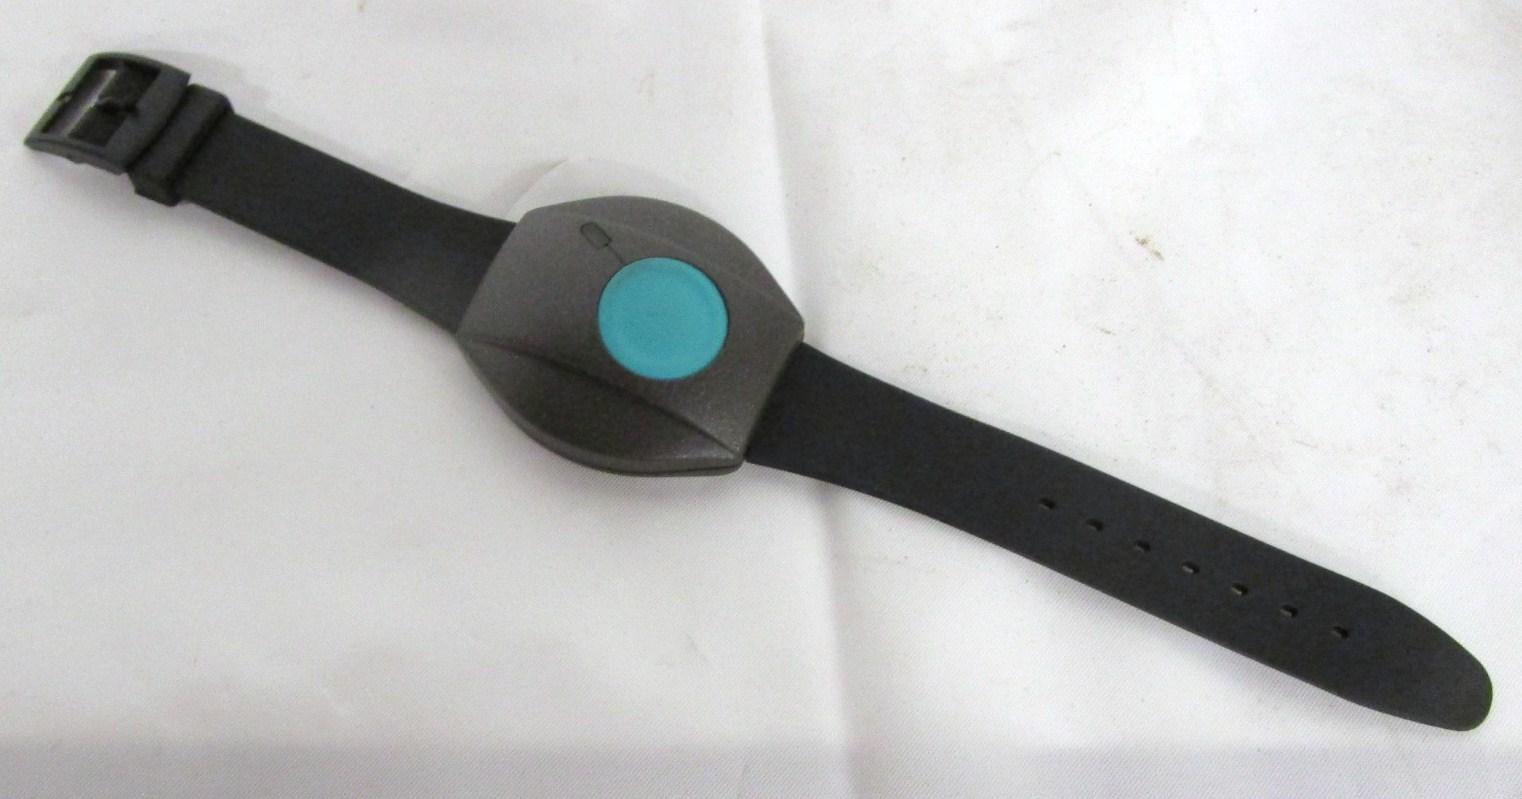 Wrist tracking device